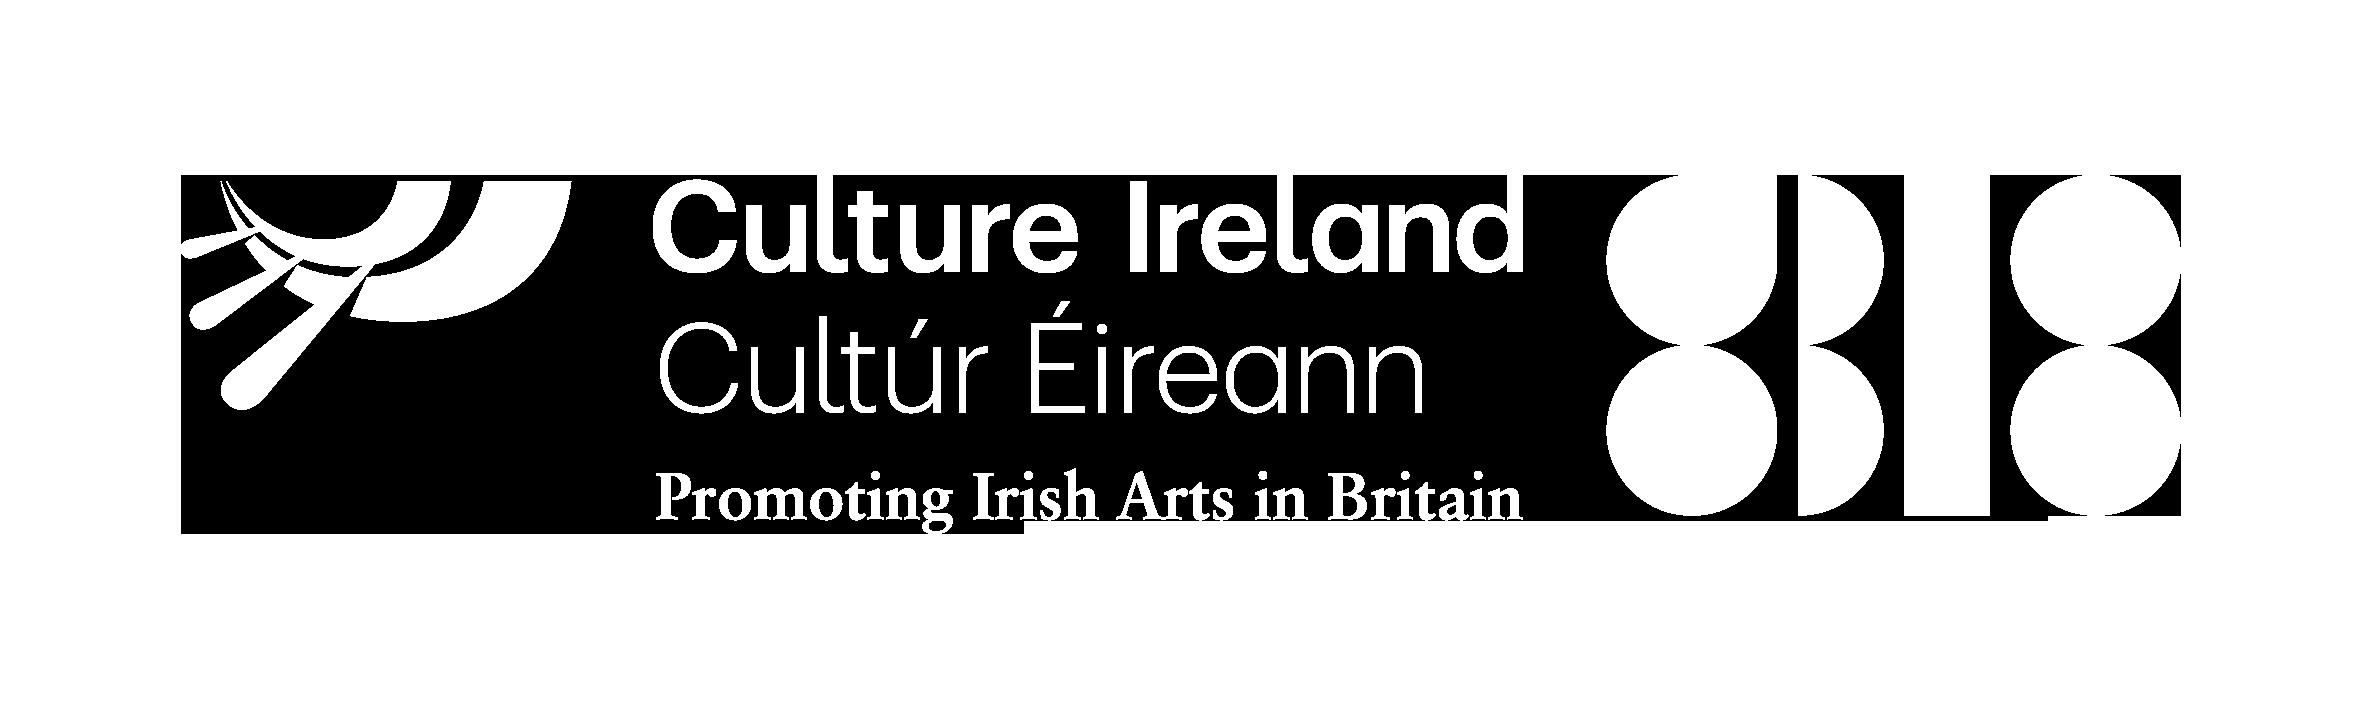 Culture Ireland logo GB Irish Film London